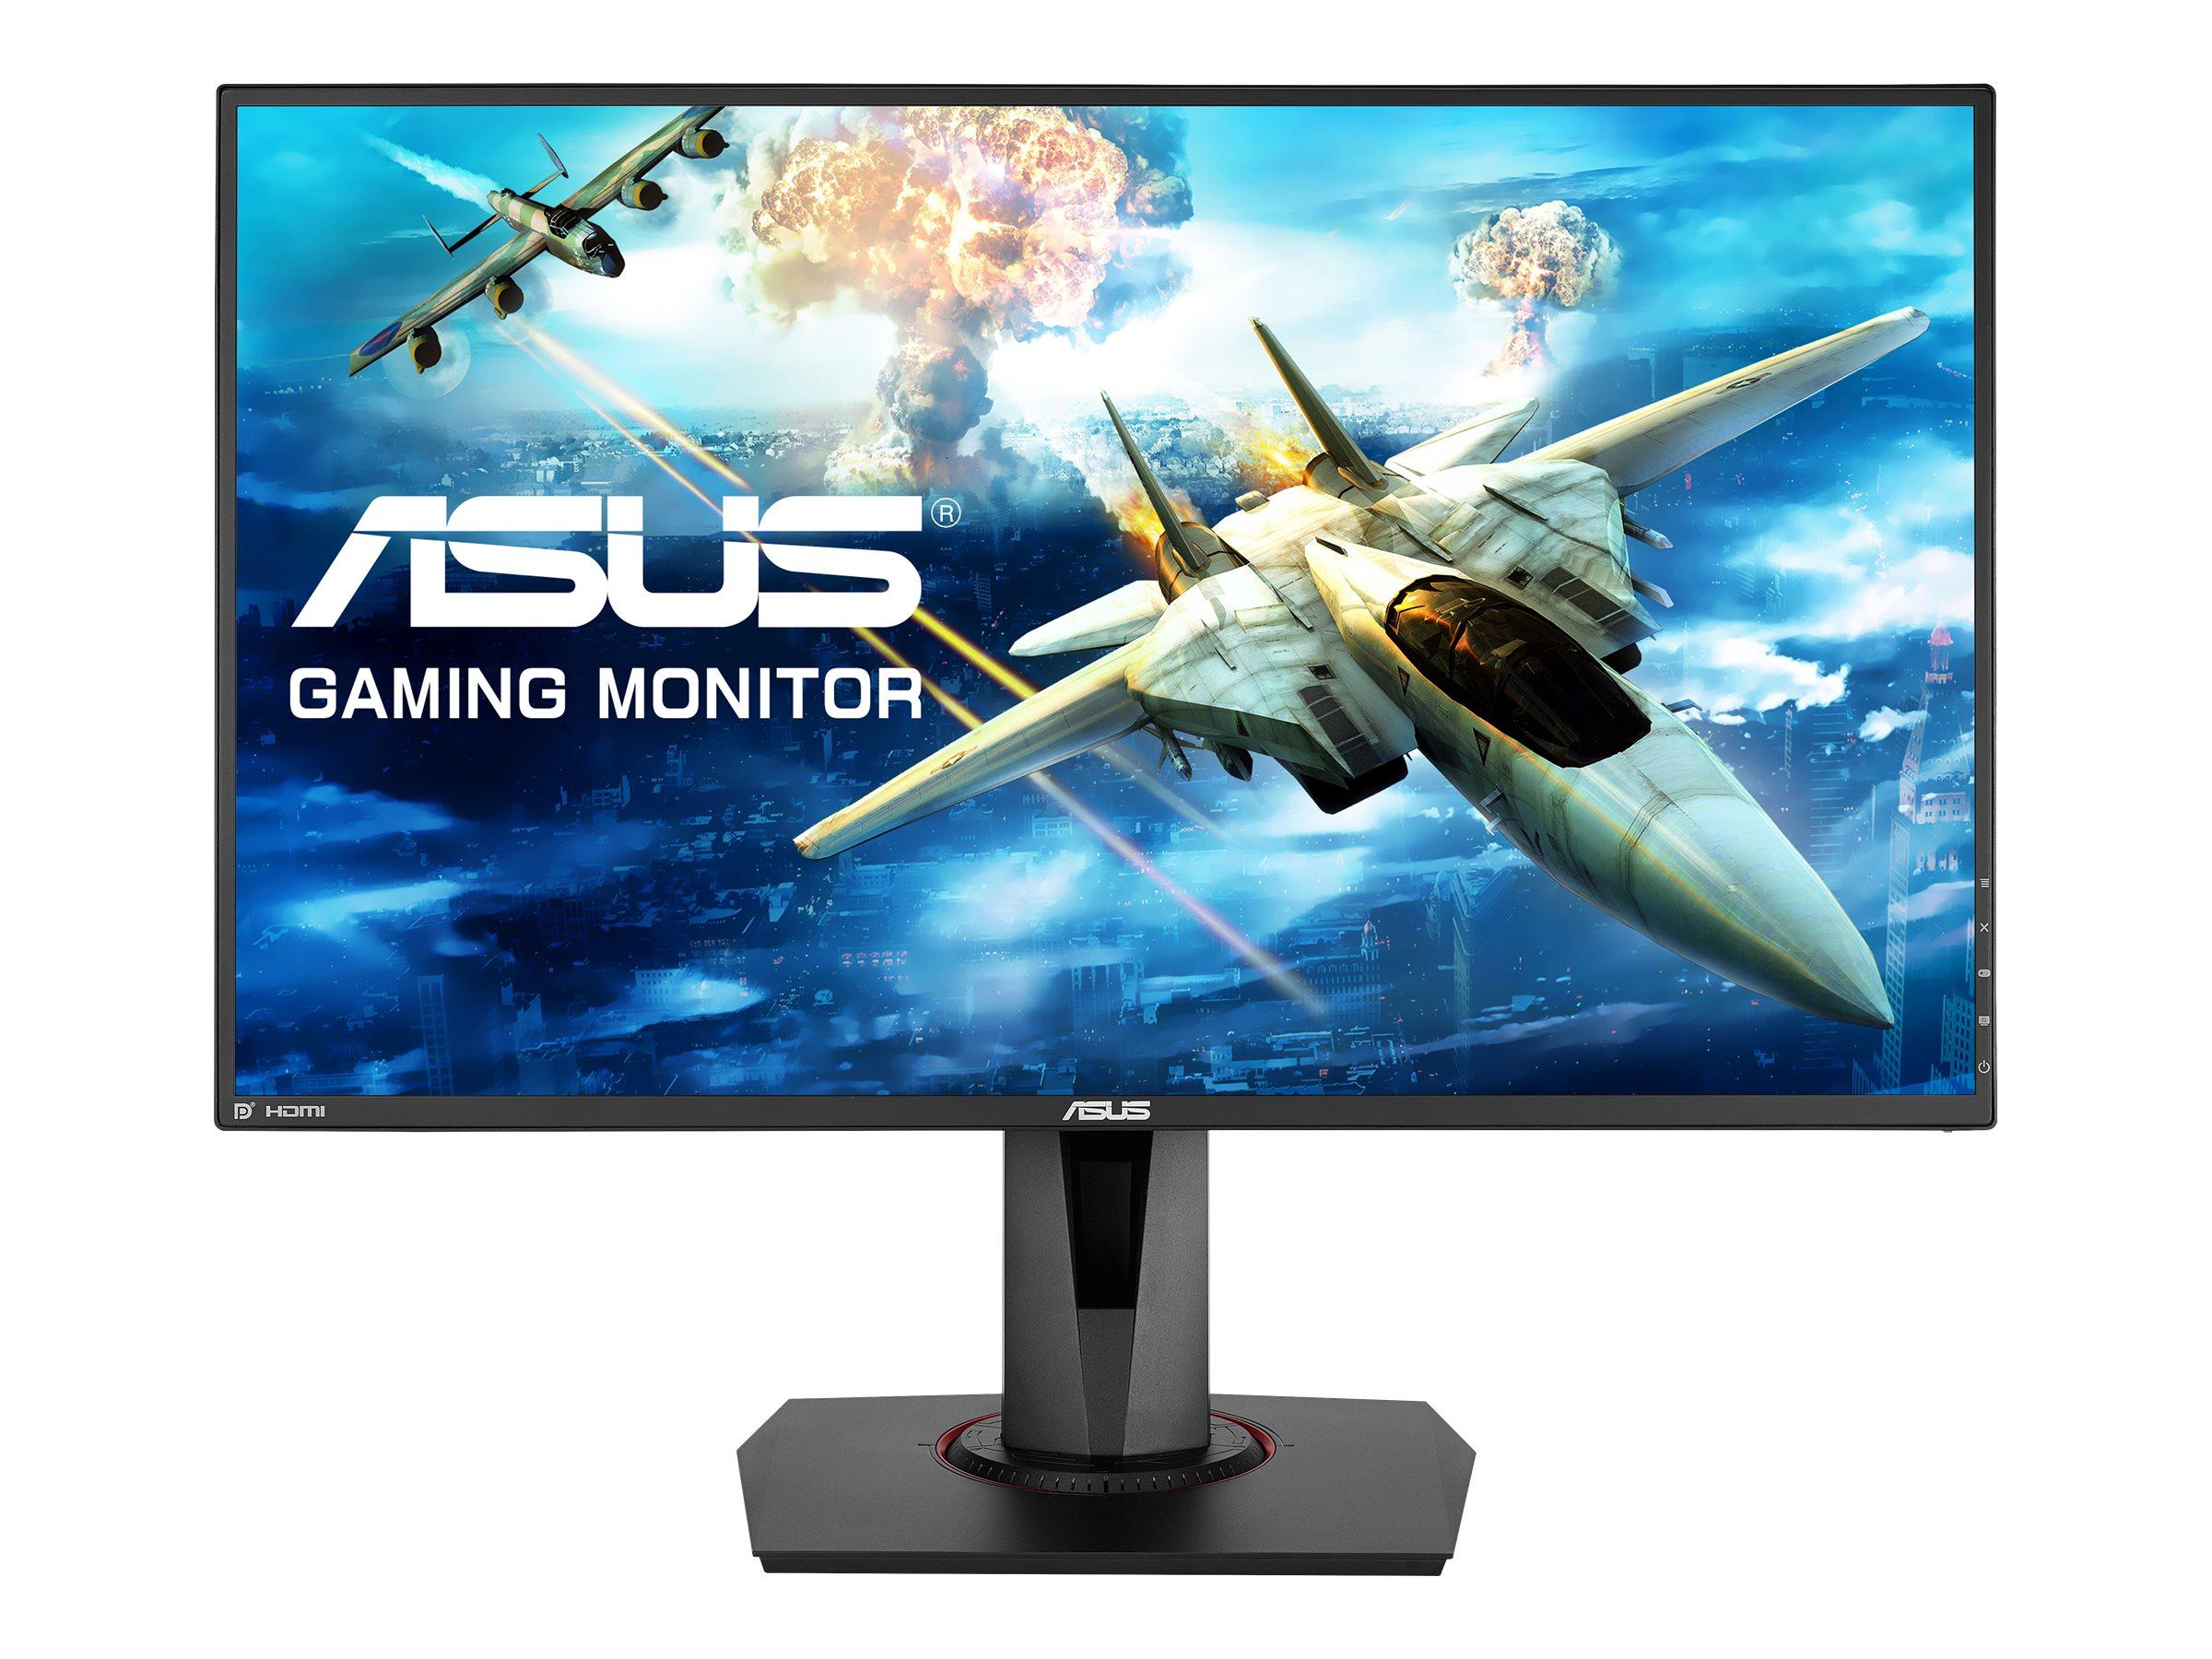 "ASUS VG278Q - LCD-Monitor - 68.6 cm (27"") - 1920 x 1080 Full HD (1080p) TN - 400 cd/m² - 1000:1 - 1 ms - HDMI - DVI-D - DP - Lautsprecher - Schwarz"